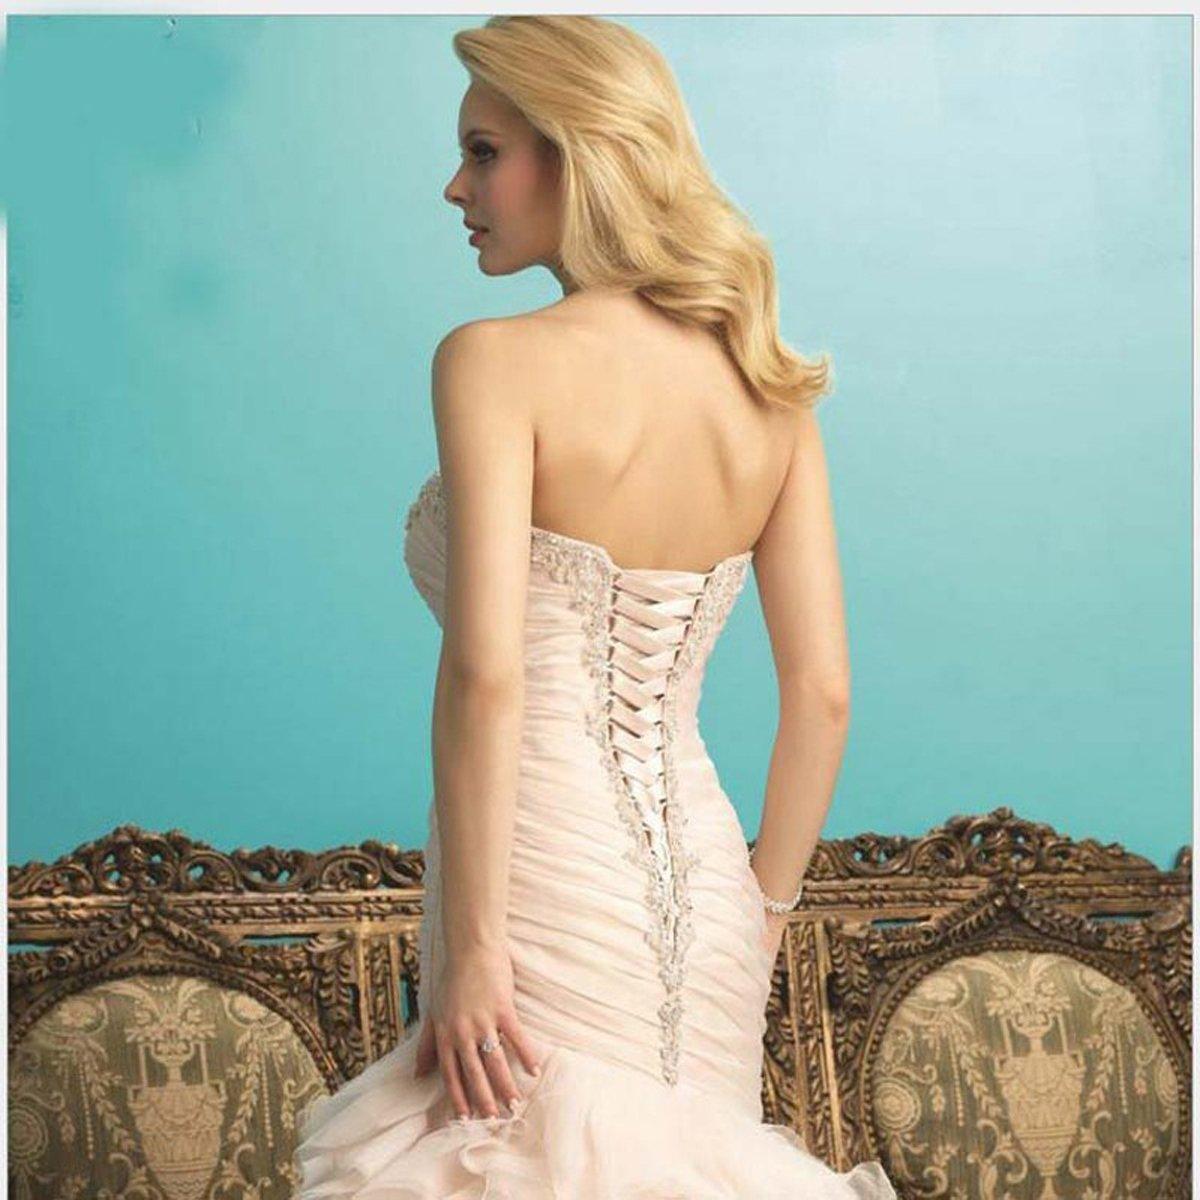 Angel Formal Dresses Women's Sweetheart Applique Beaded Mermaid Ruffles Tulle Wedding Dresses Gown(18,Ivory) by Angel Formal Dresses (Image #3)